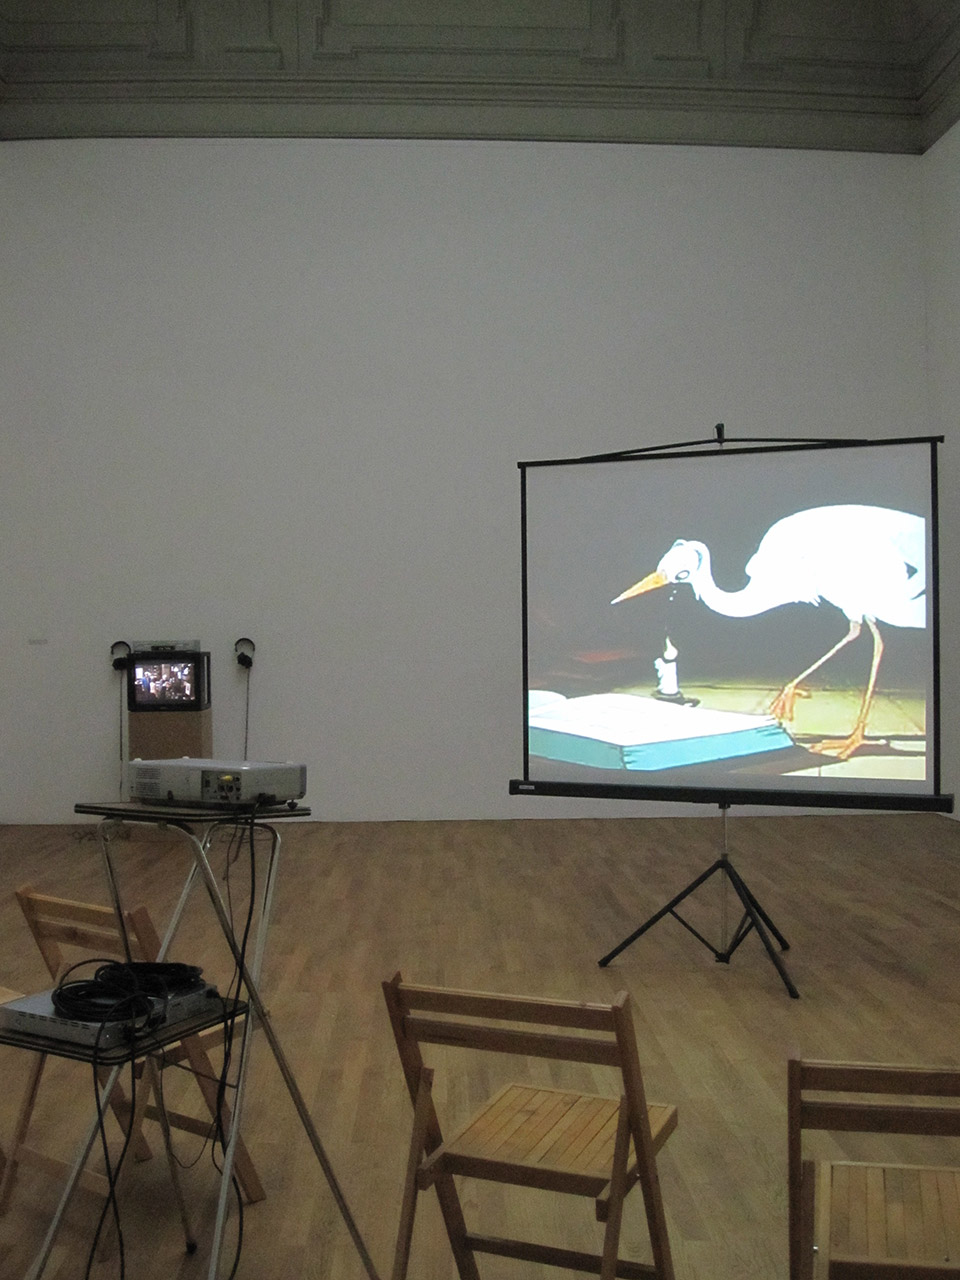 Lars-Laumann-Kunsthalle-Winterthur-2011-4.jpg